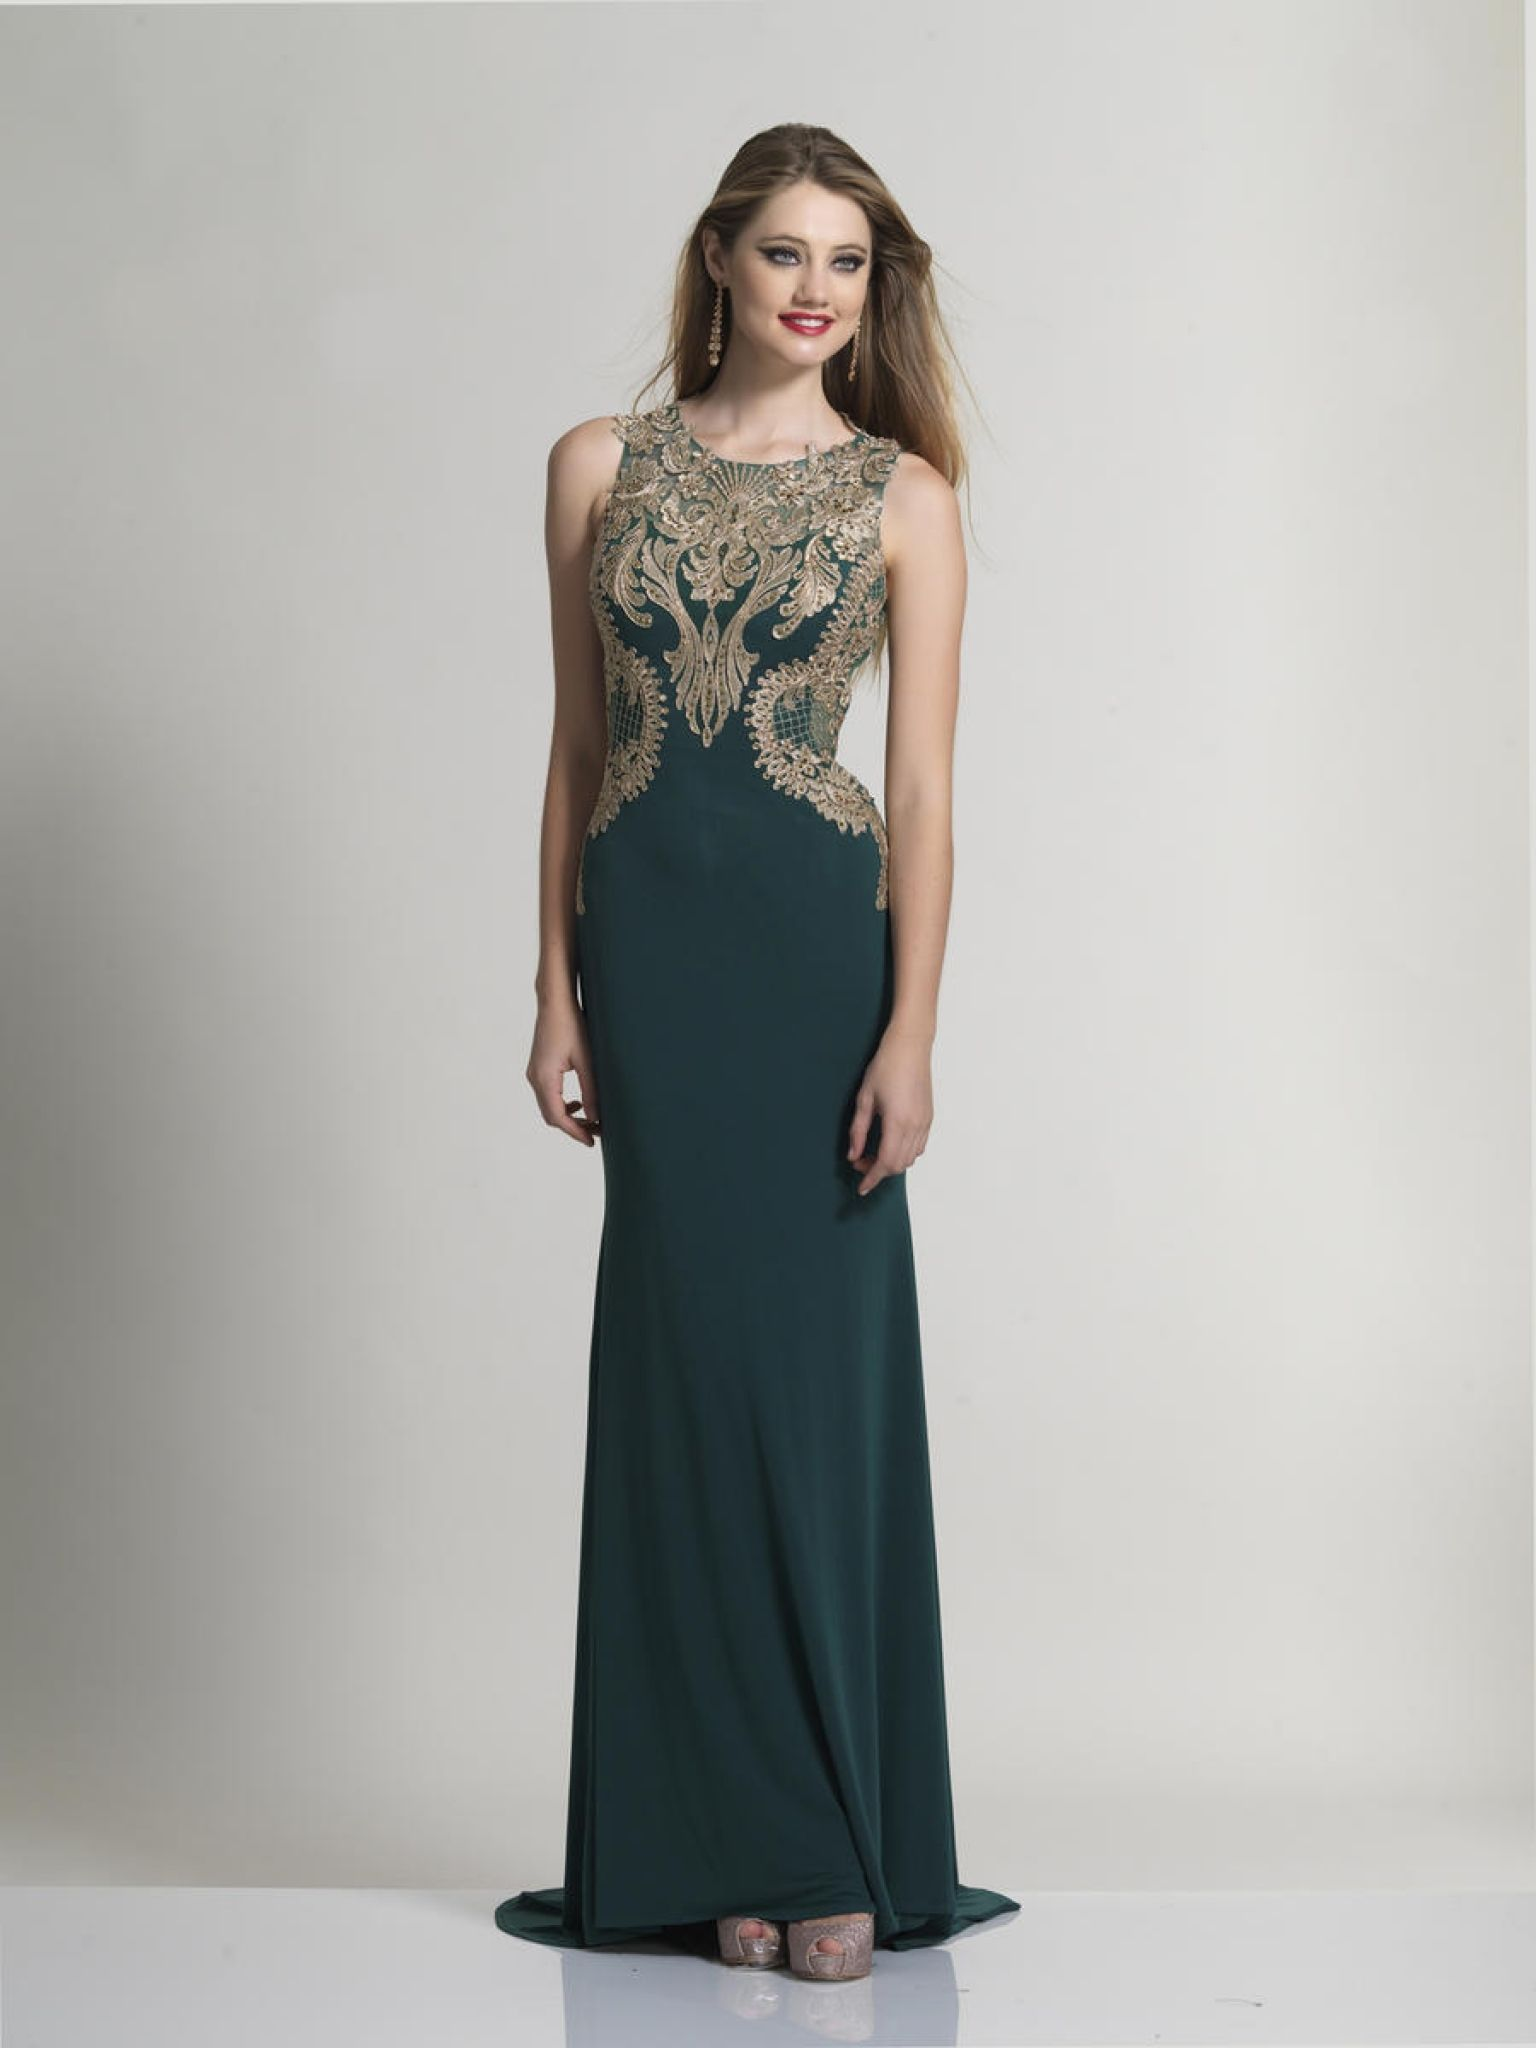 von maur dresses weddings - cute dresses for a wedding Check more at ...